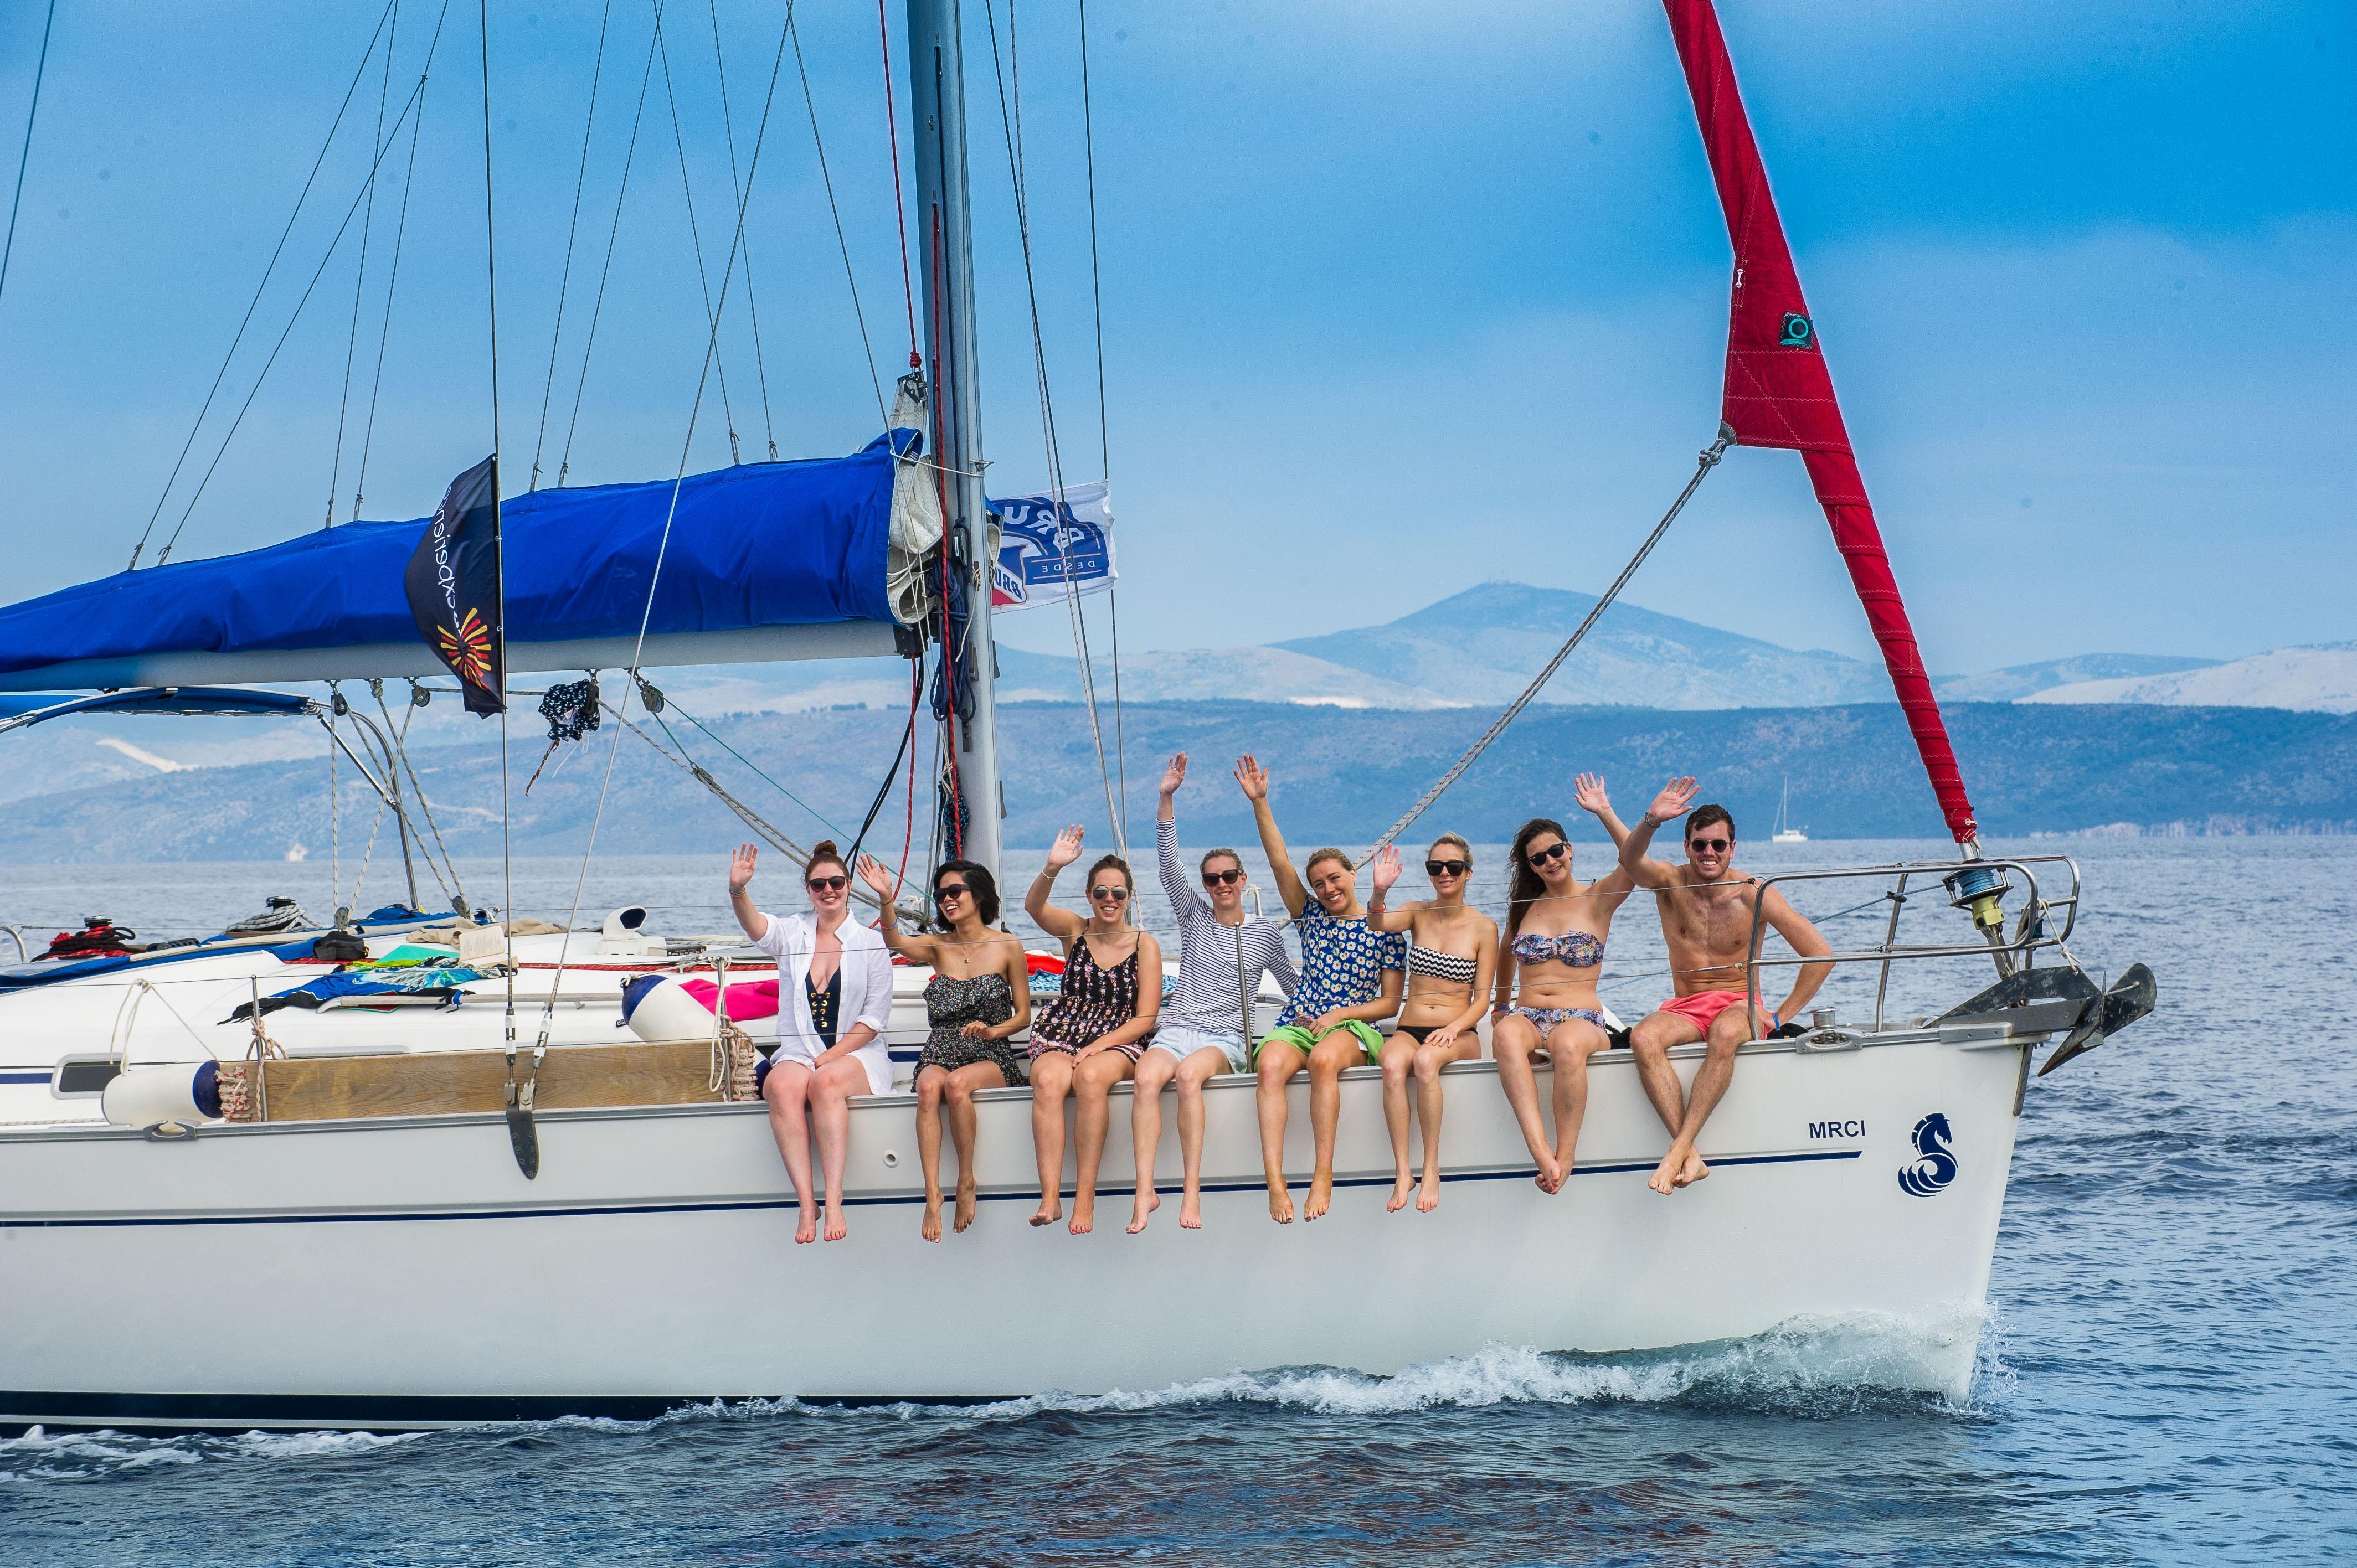 croatia yacht tours sail croatia party flotilla for under 35 u0027s